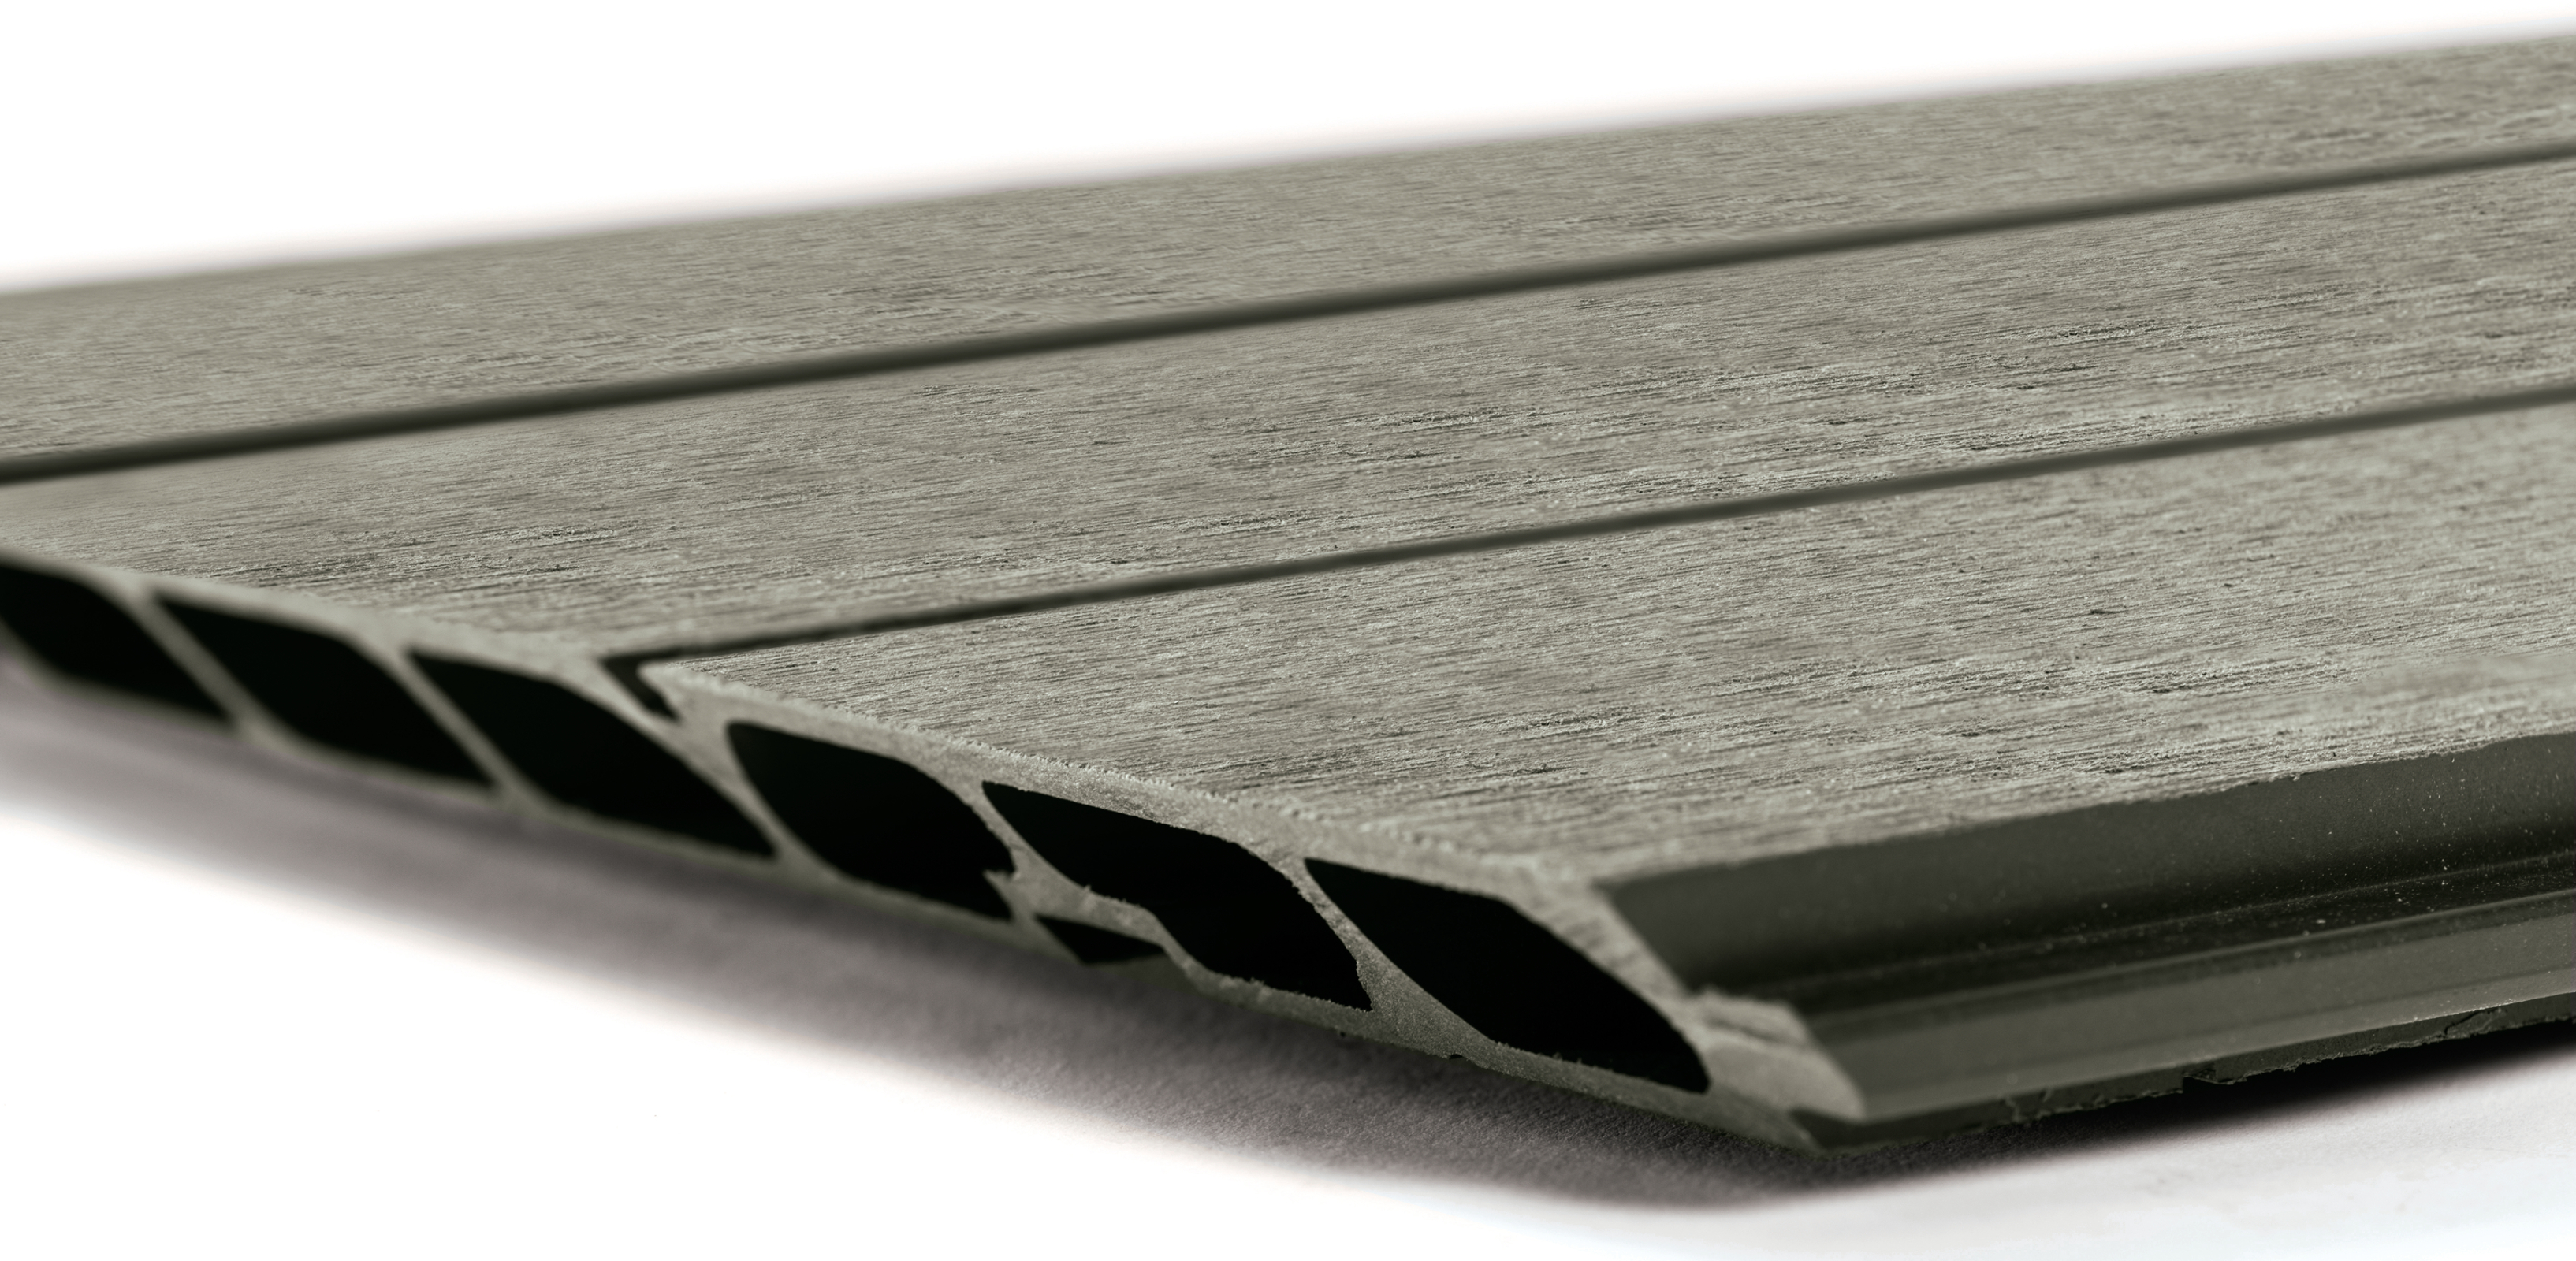 Craftsman 7.5' x 4' Wood Plastic Composite Storage Building